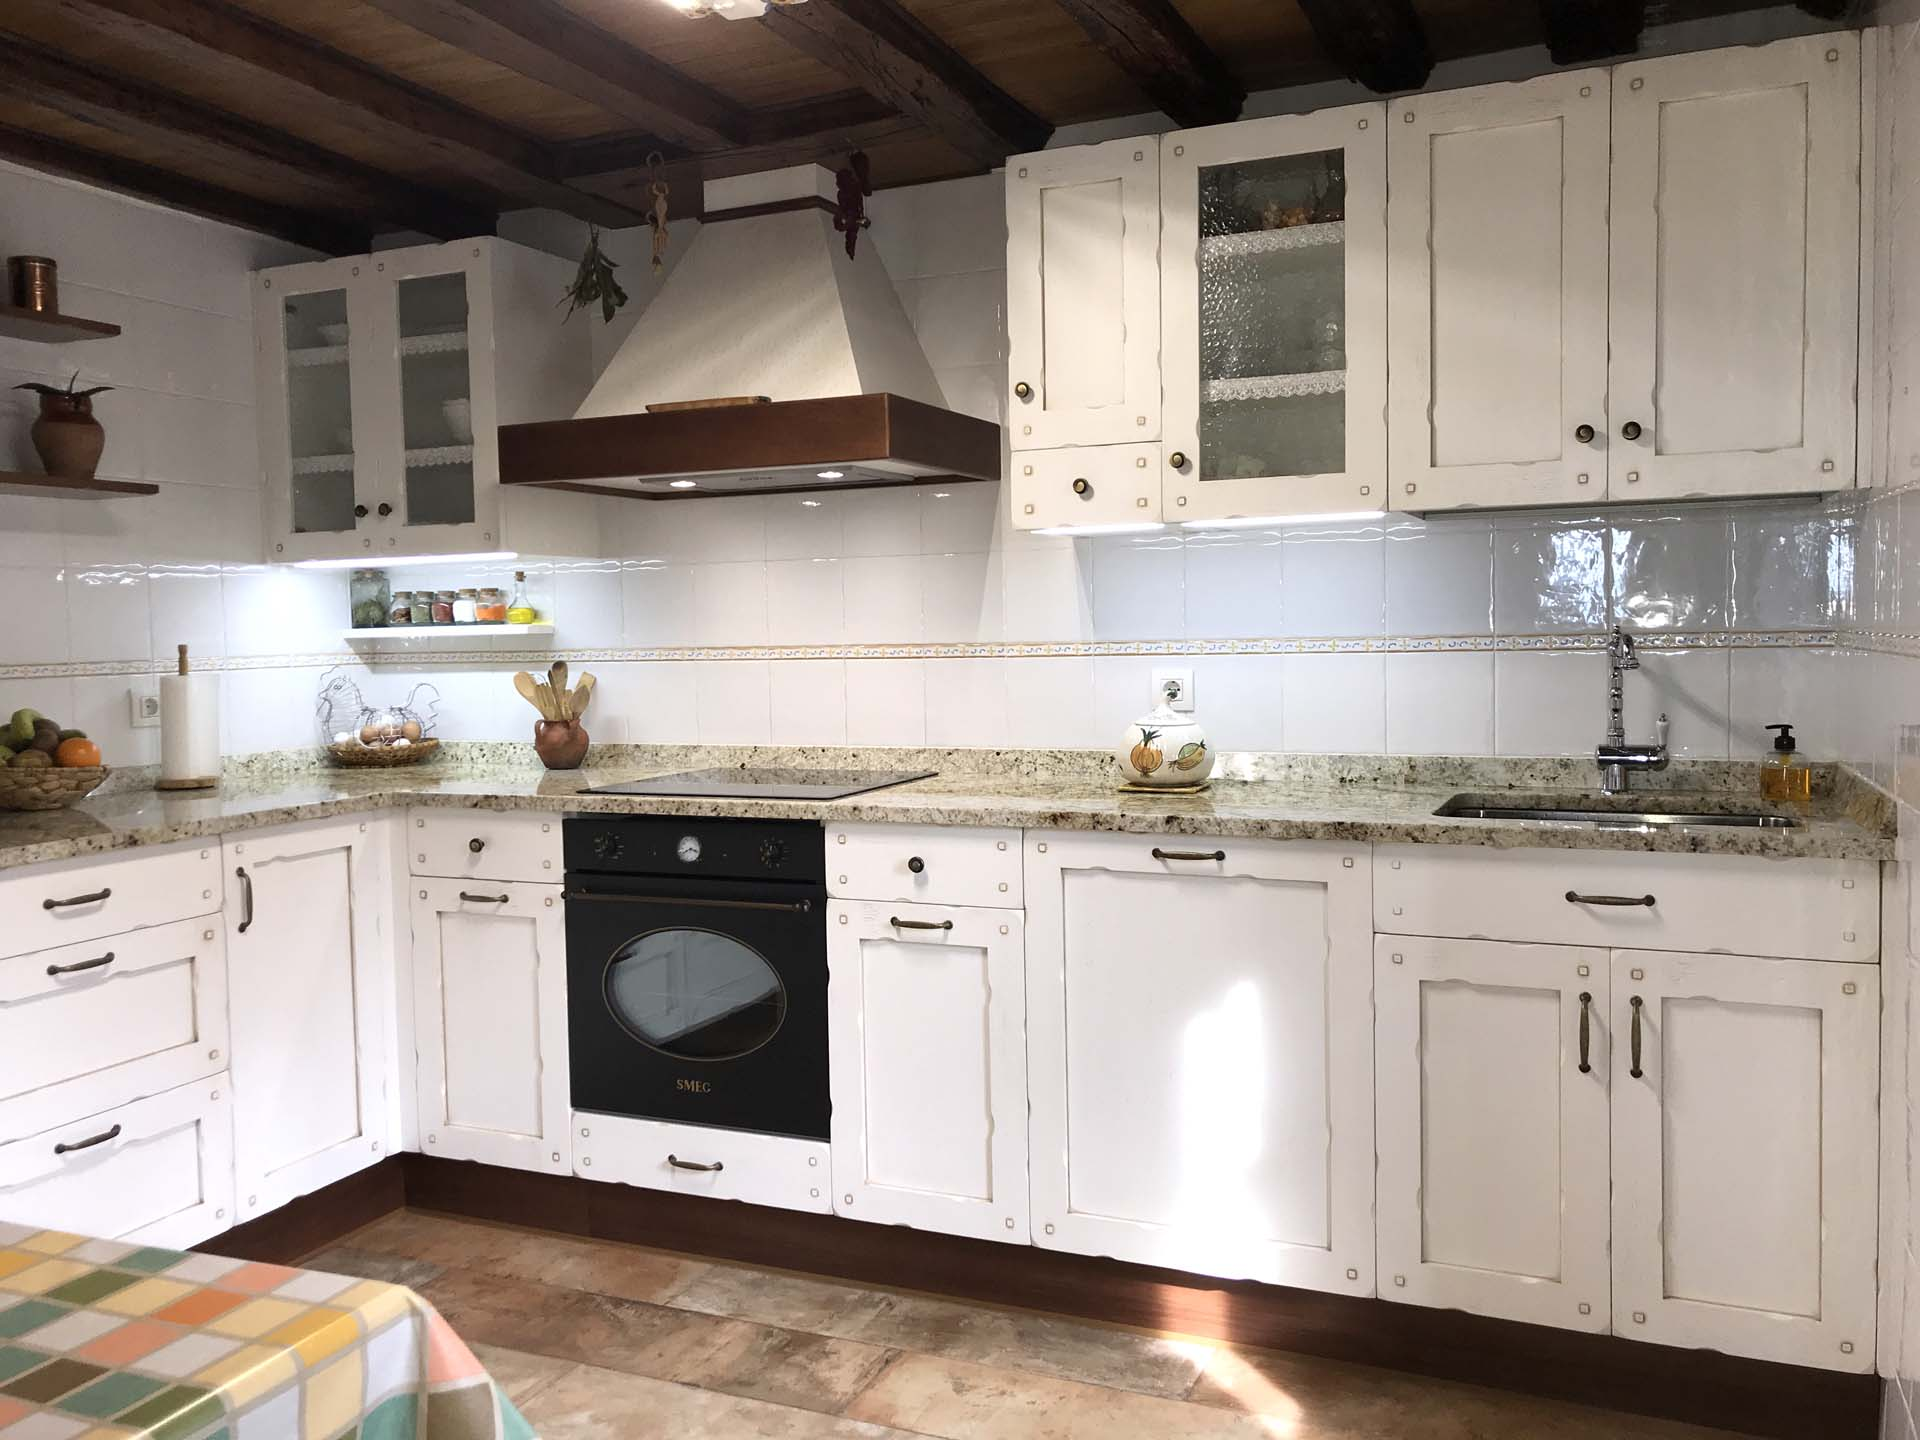 Cocina en madera de roble modelo castilla arnit for Muebles de algarrobo precios